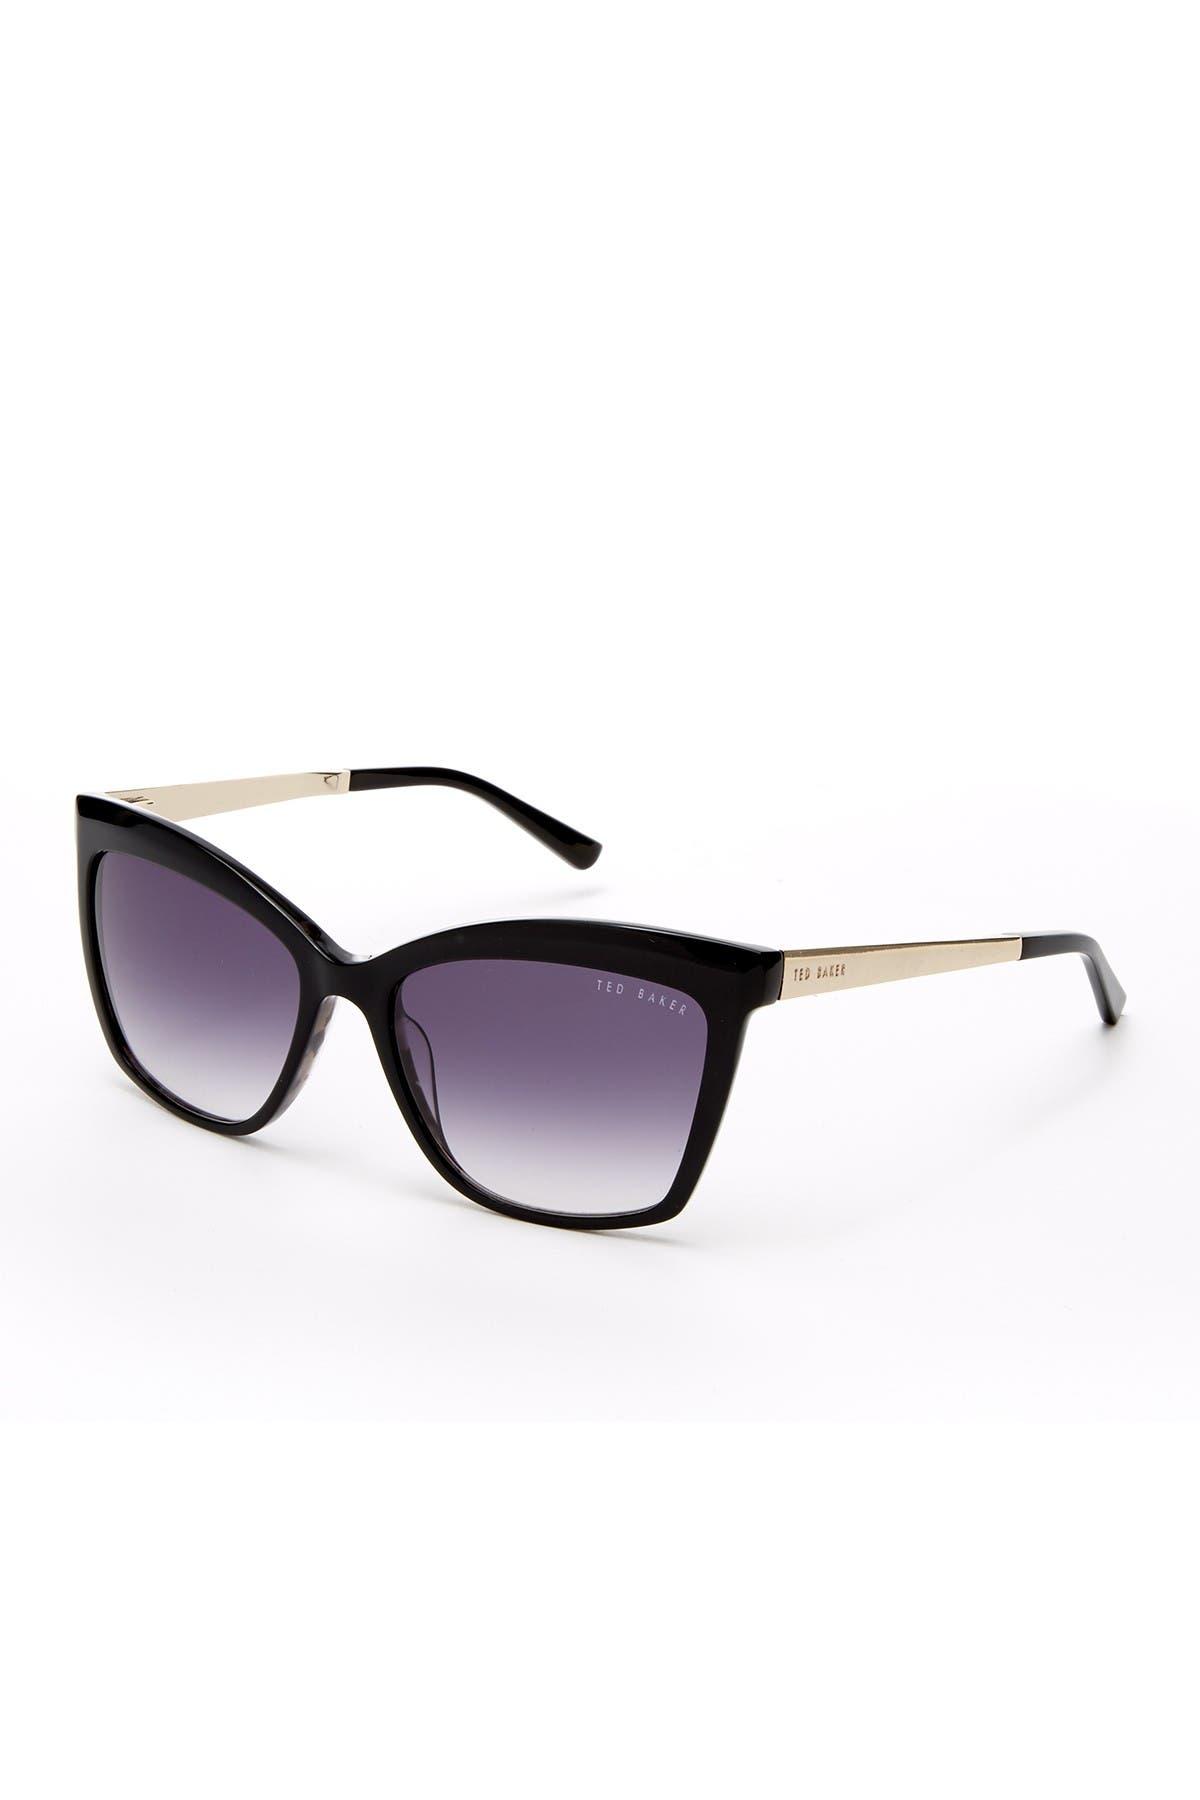 Image of Ted Baker London Square Cat Eye 56mm Sunglasses